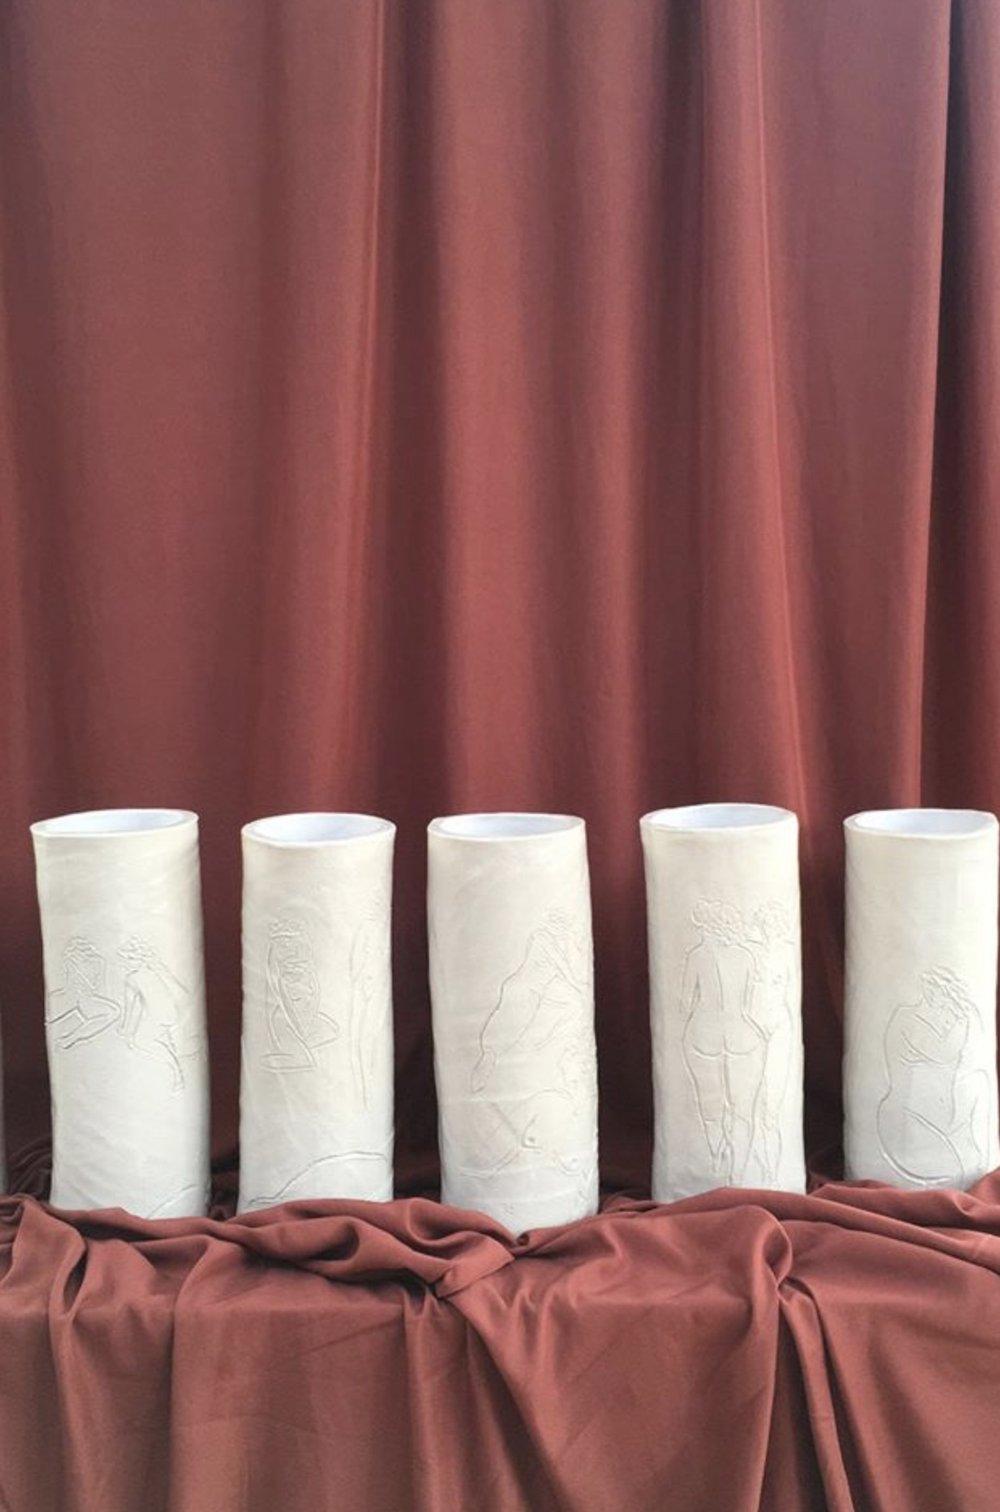 Ceramics - Alexandria Coe x Kana London sculptural vases.